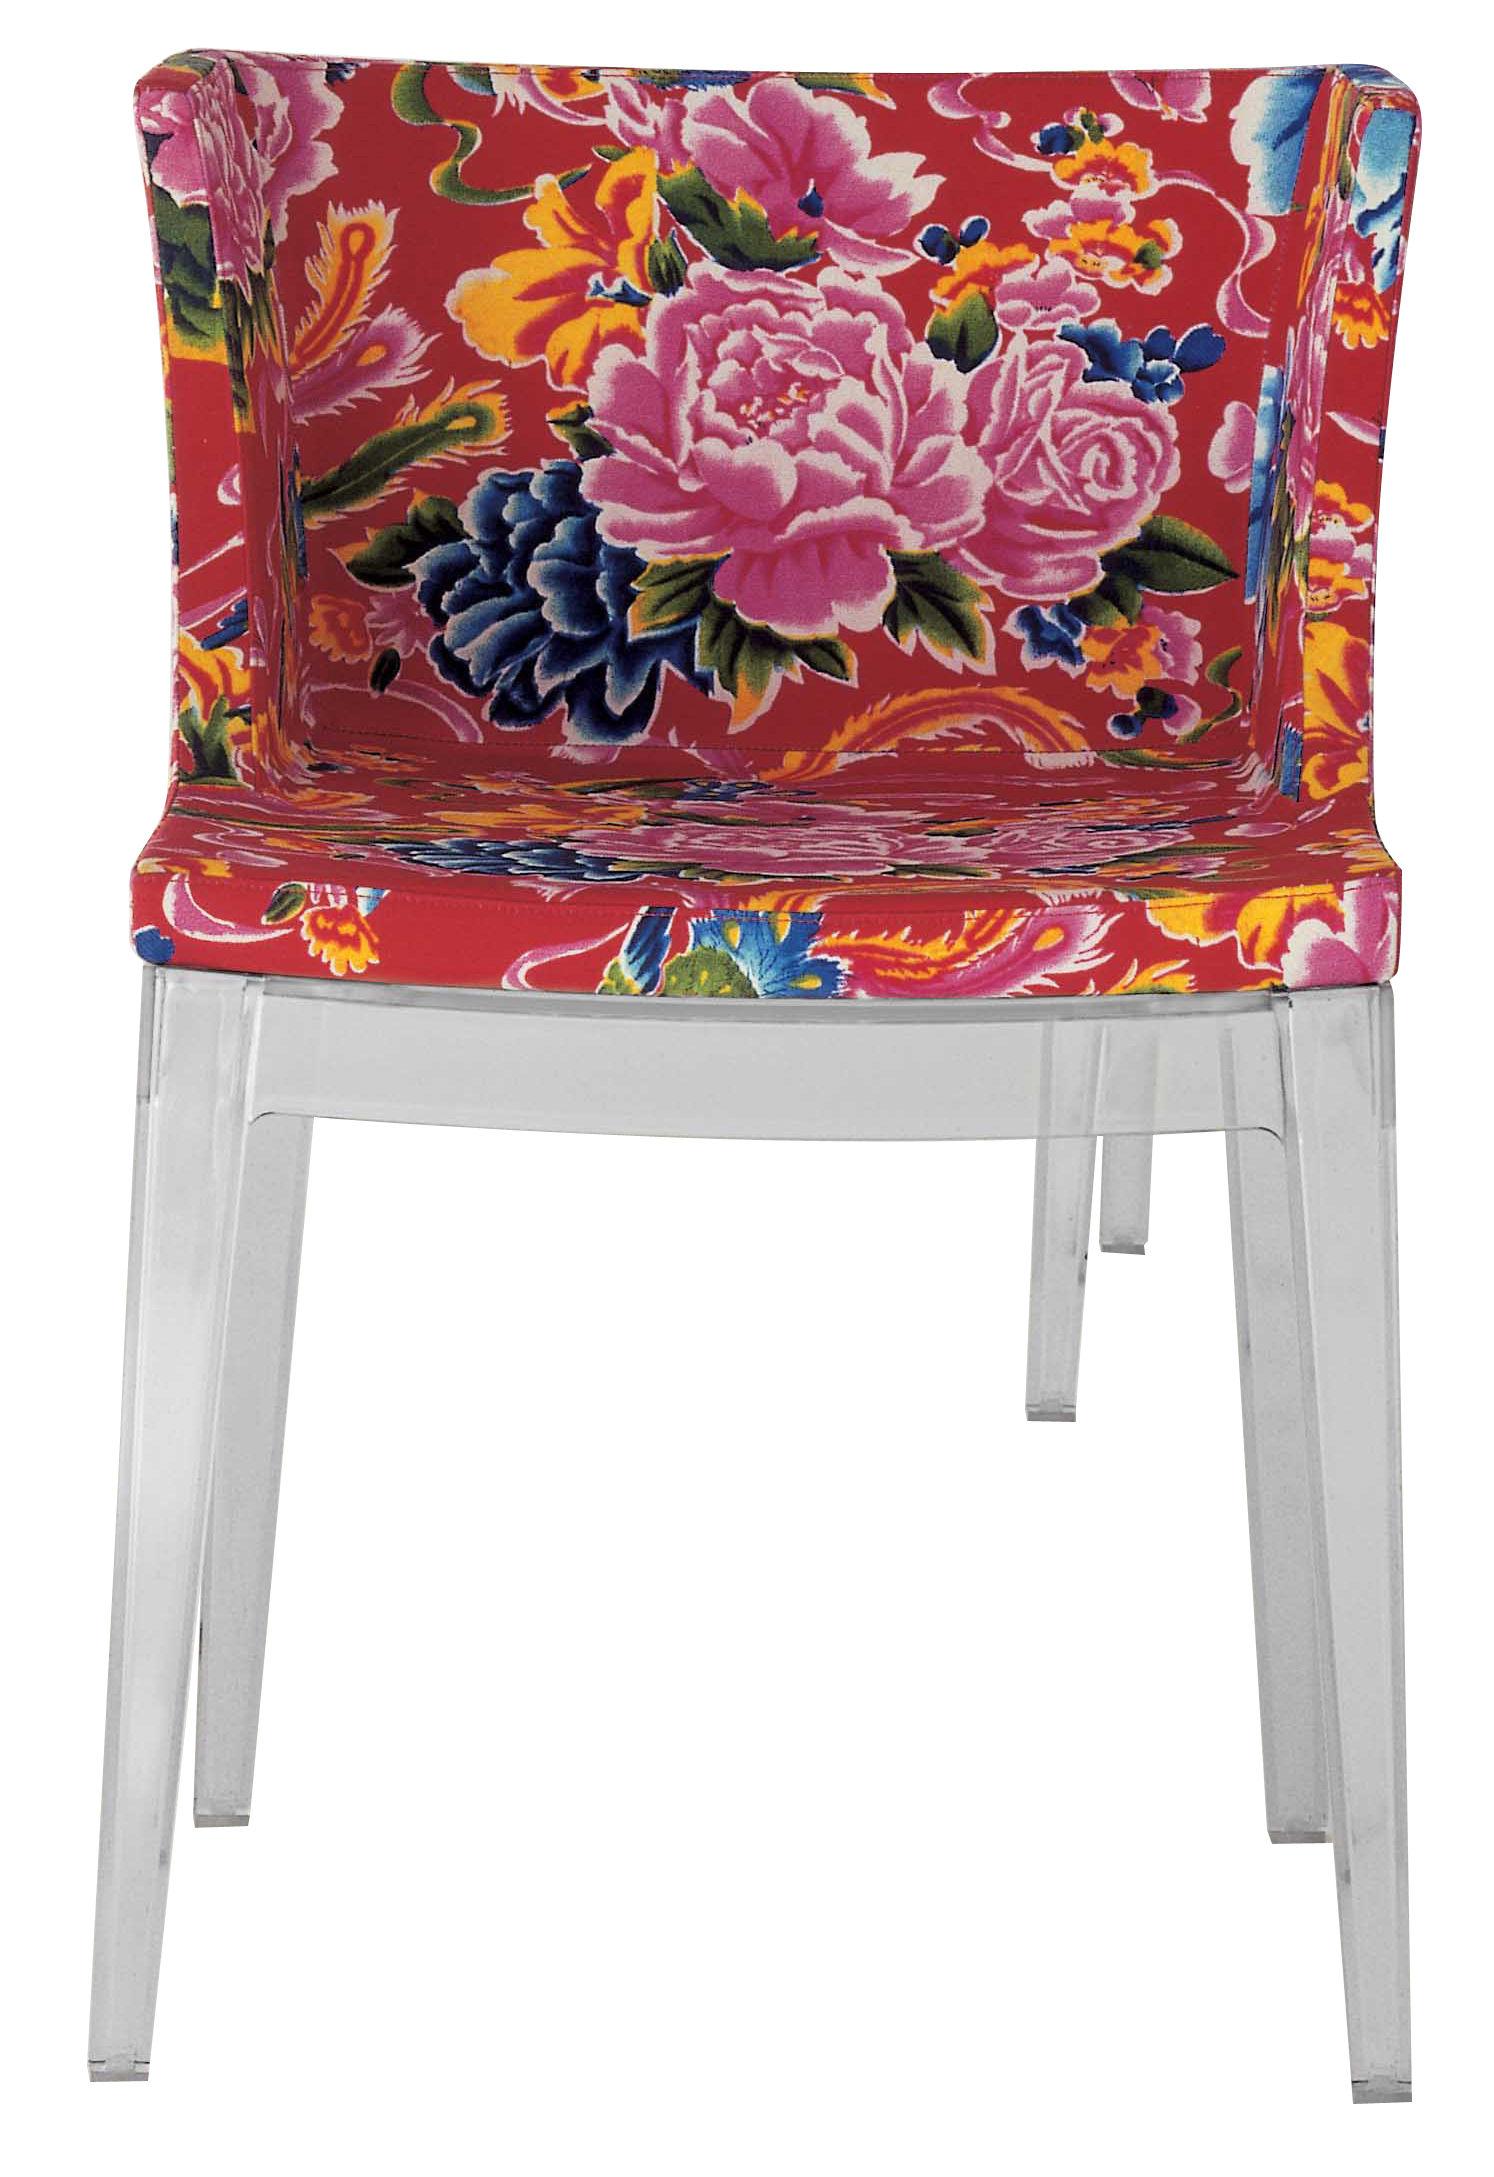 chaise kartell solde finest chaise chaise kartell inspiration chaise master kartell elegant. Black Bedroom Furniture Sets. Home Design Ideas